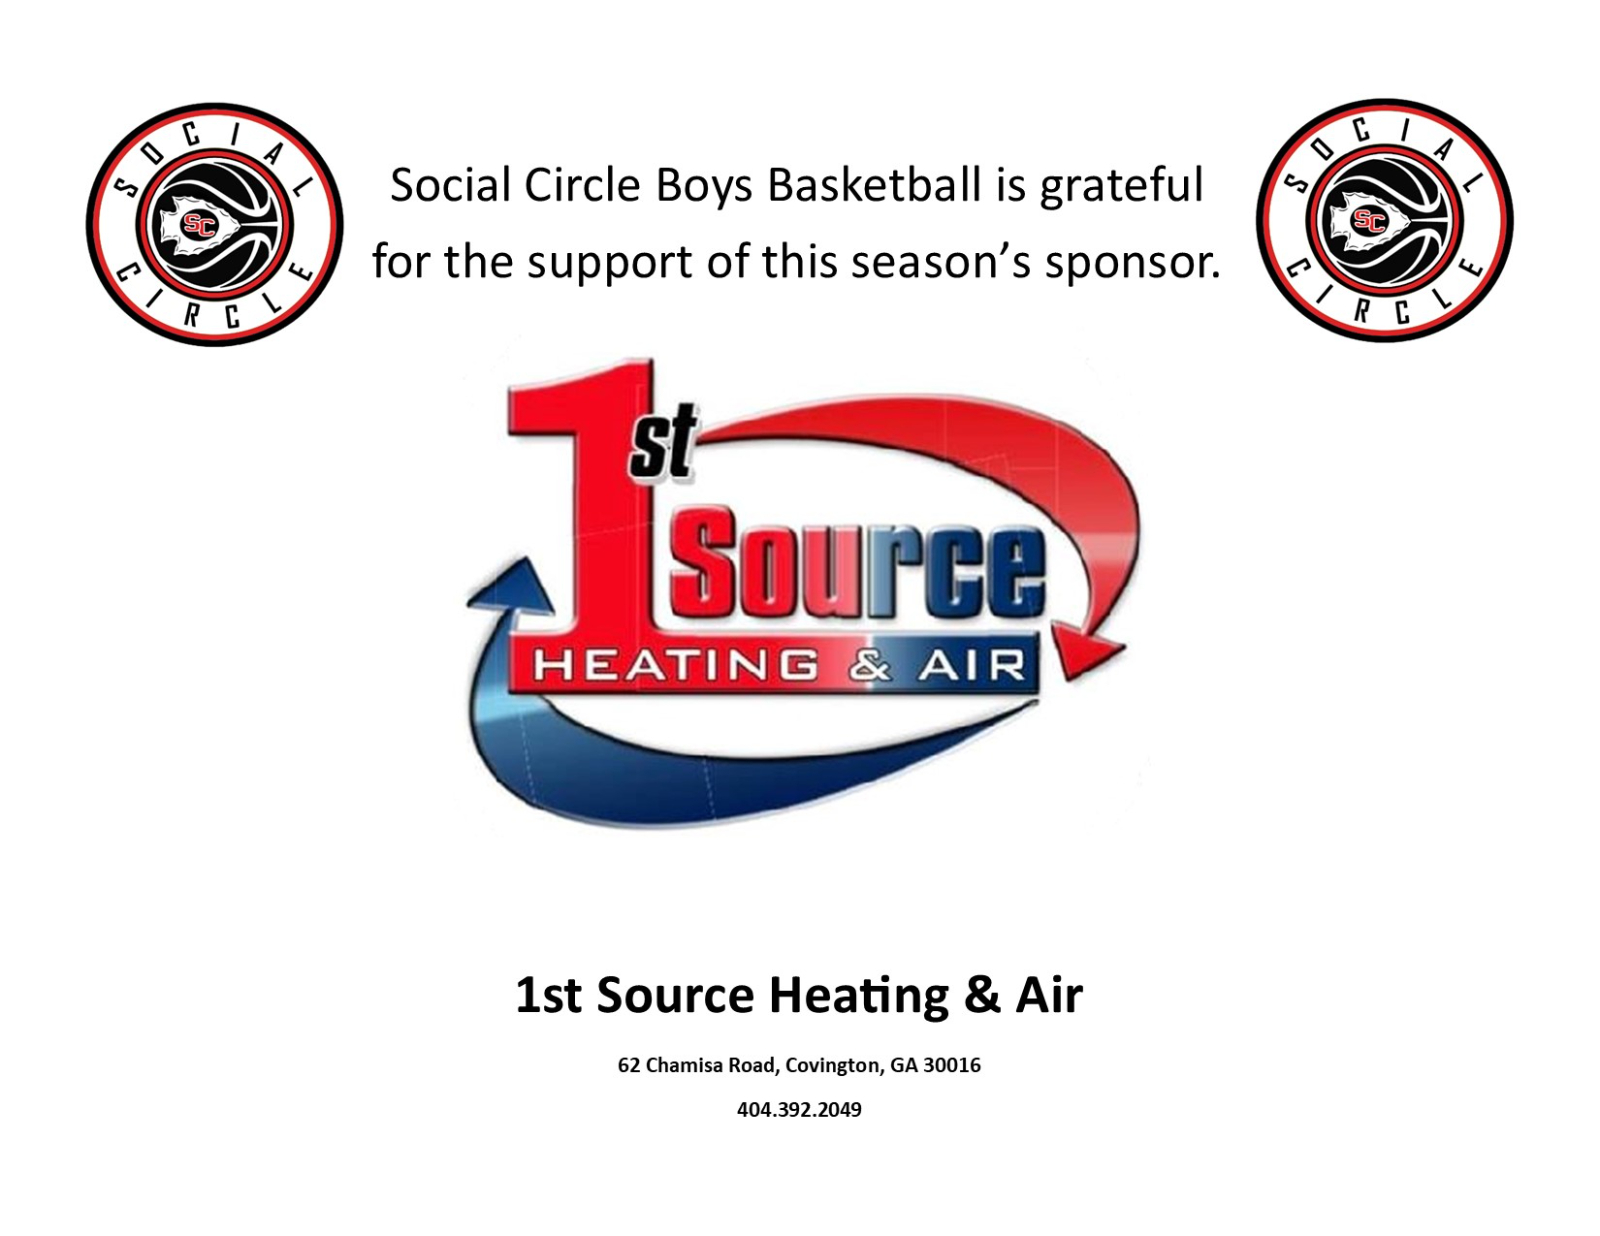 Social Circle Basketball Proudly Thanks Its Sponsor